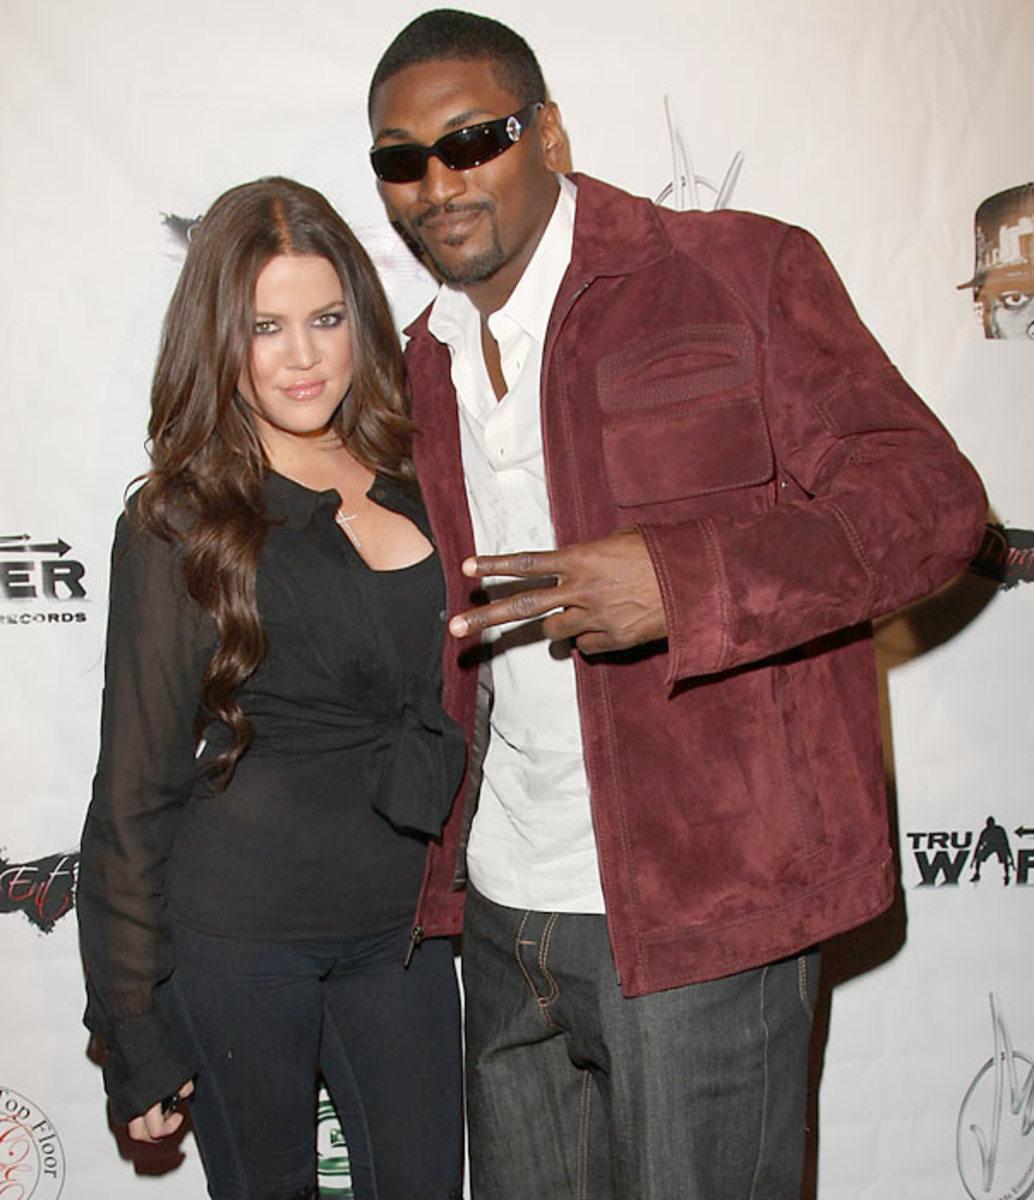 Khloe Kardashian and Ron Artest